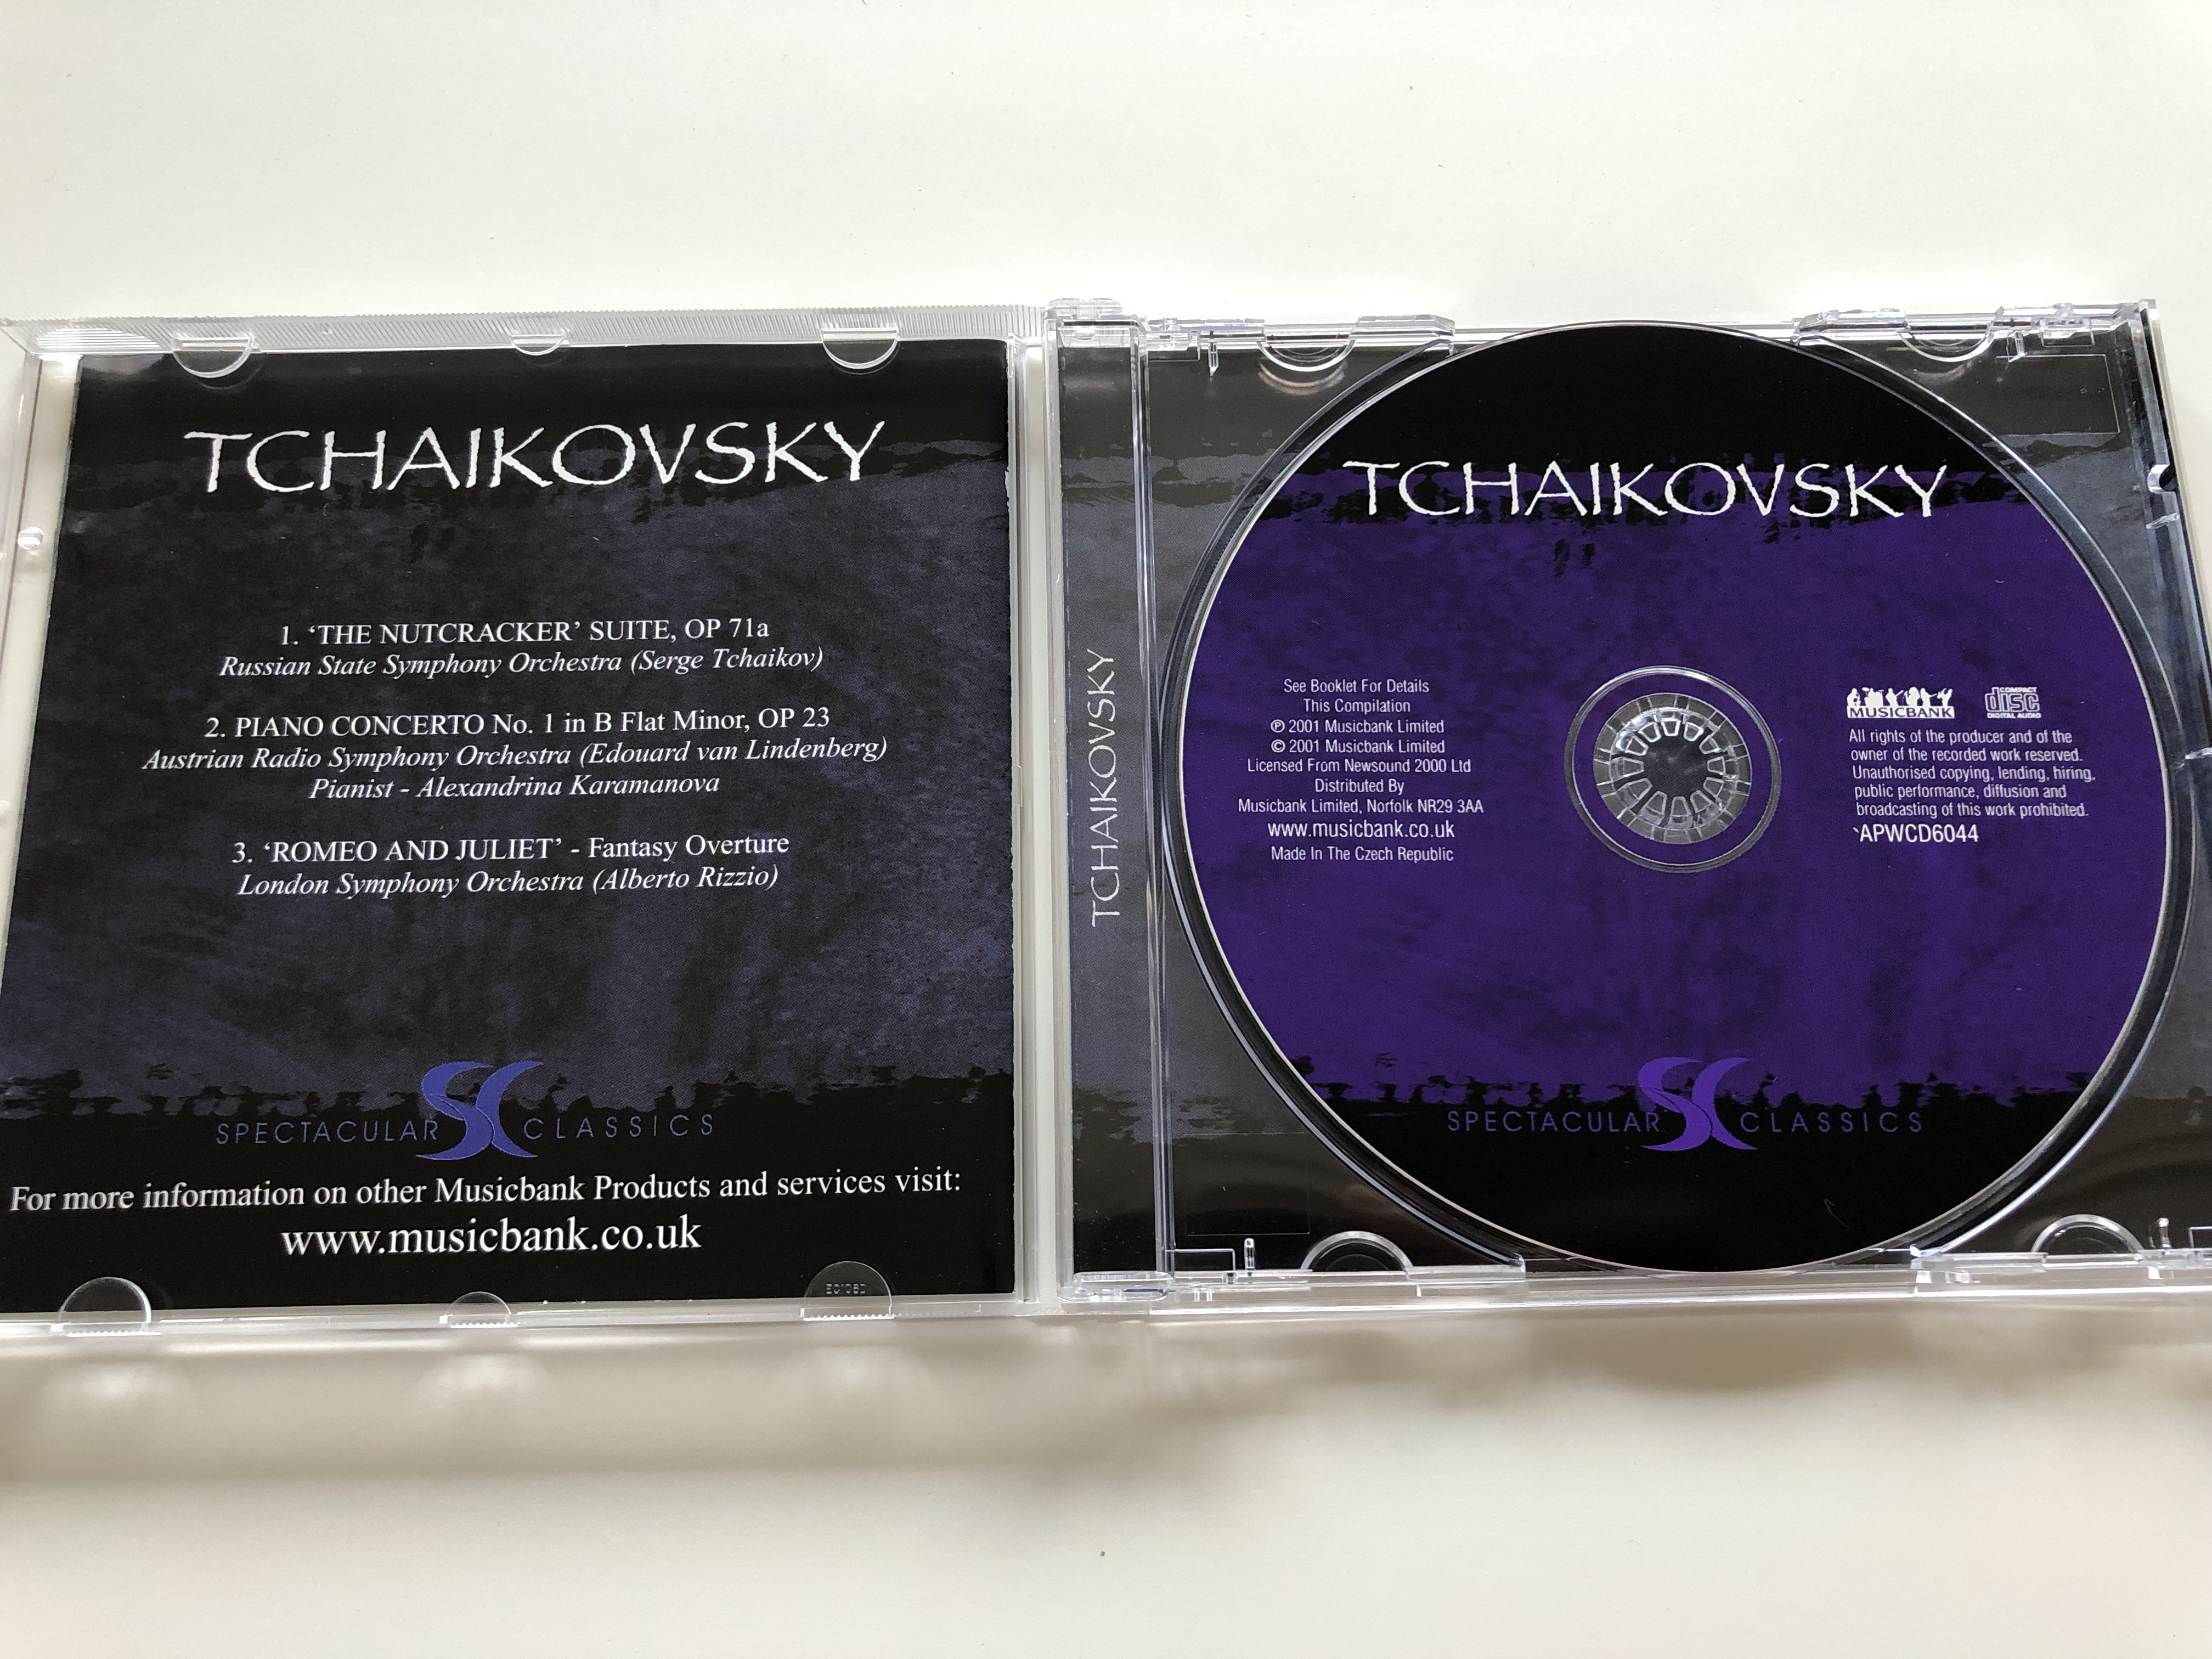 tchaikovsky-spectacular-classicsimg-2523.jpg